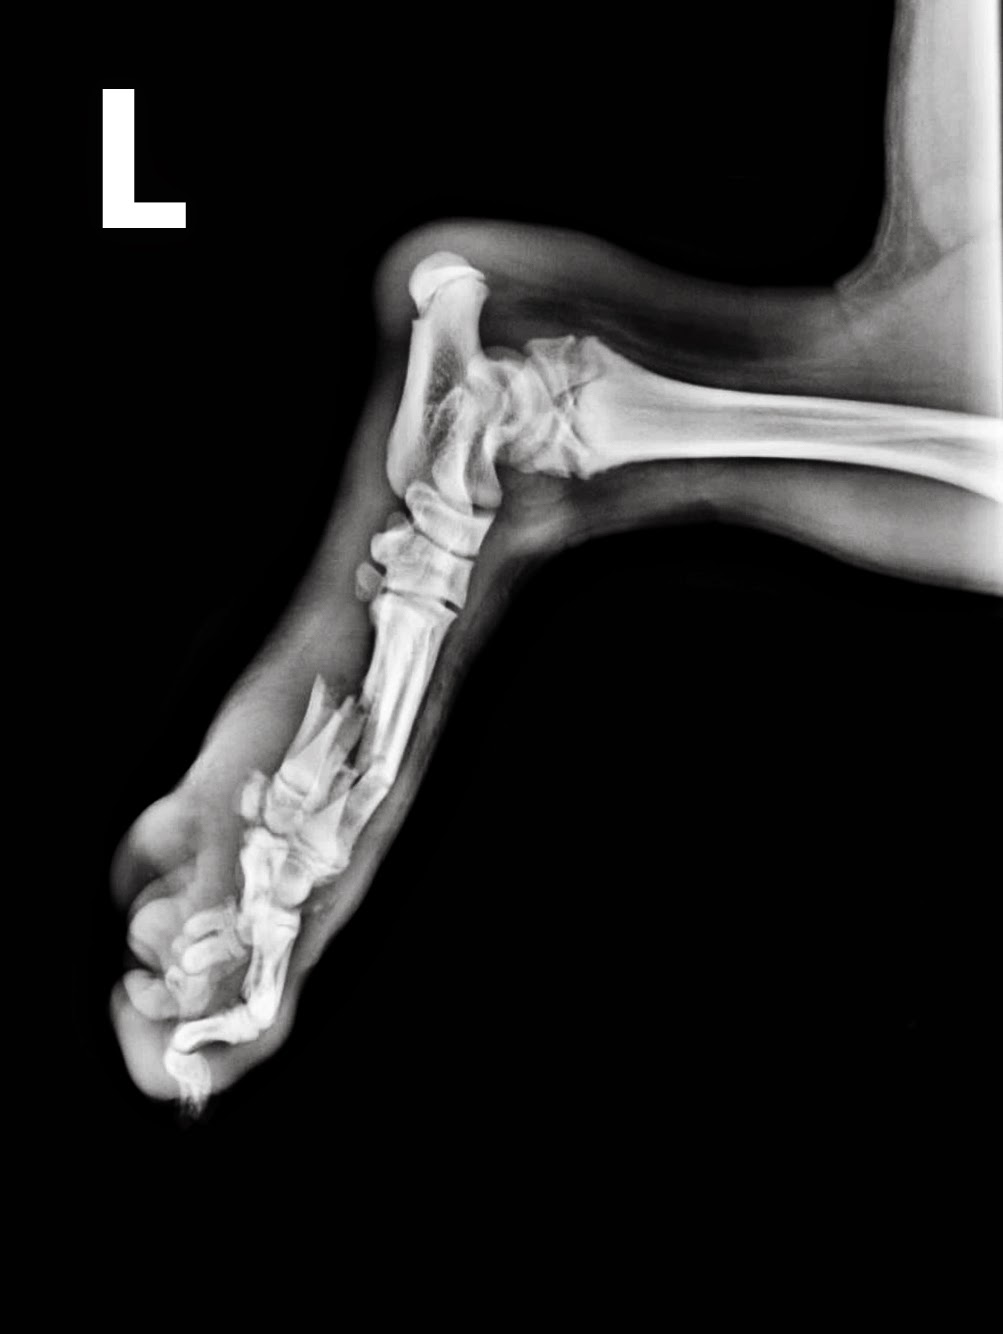 fractura metatarso cachorro